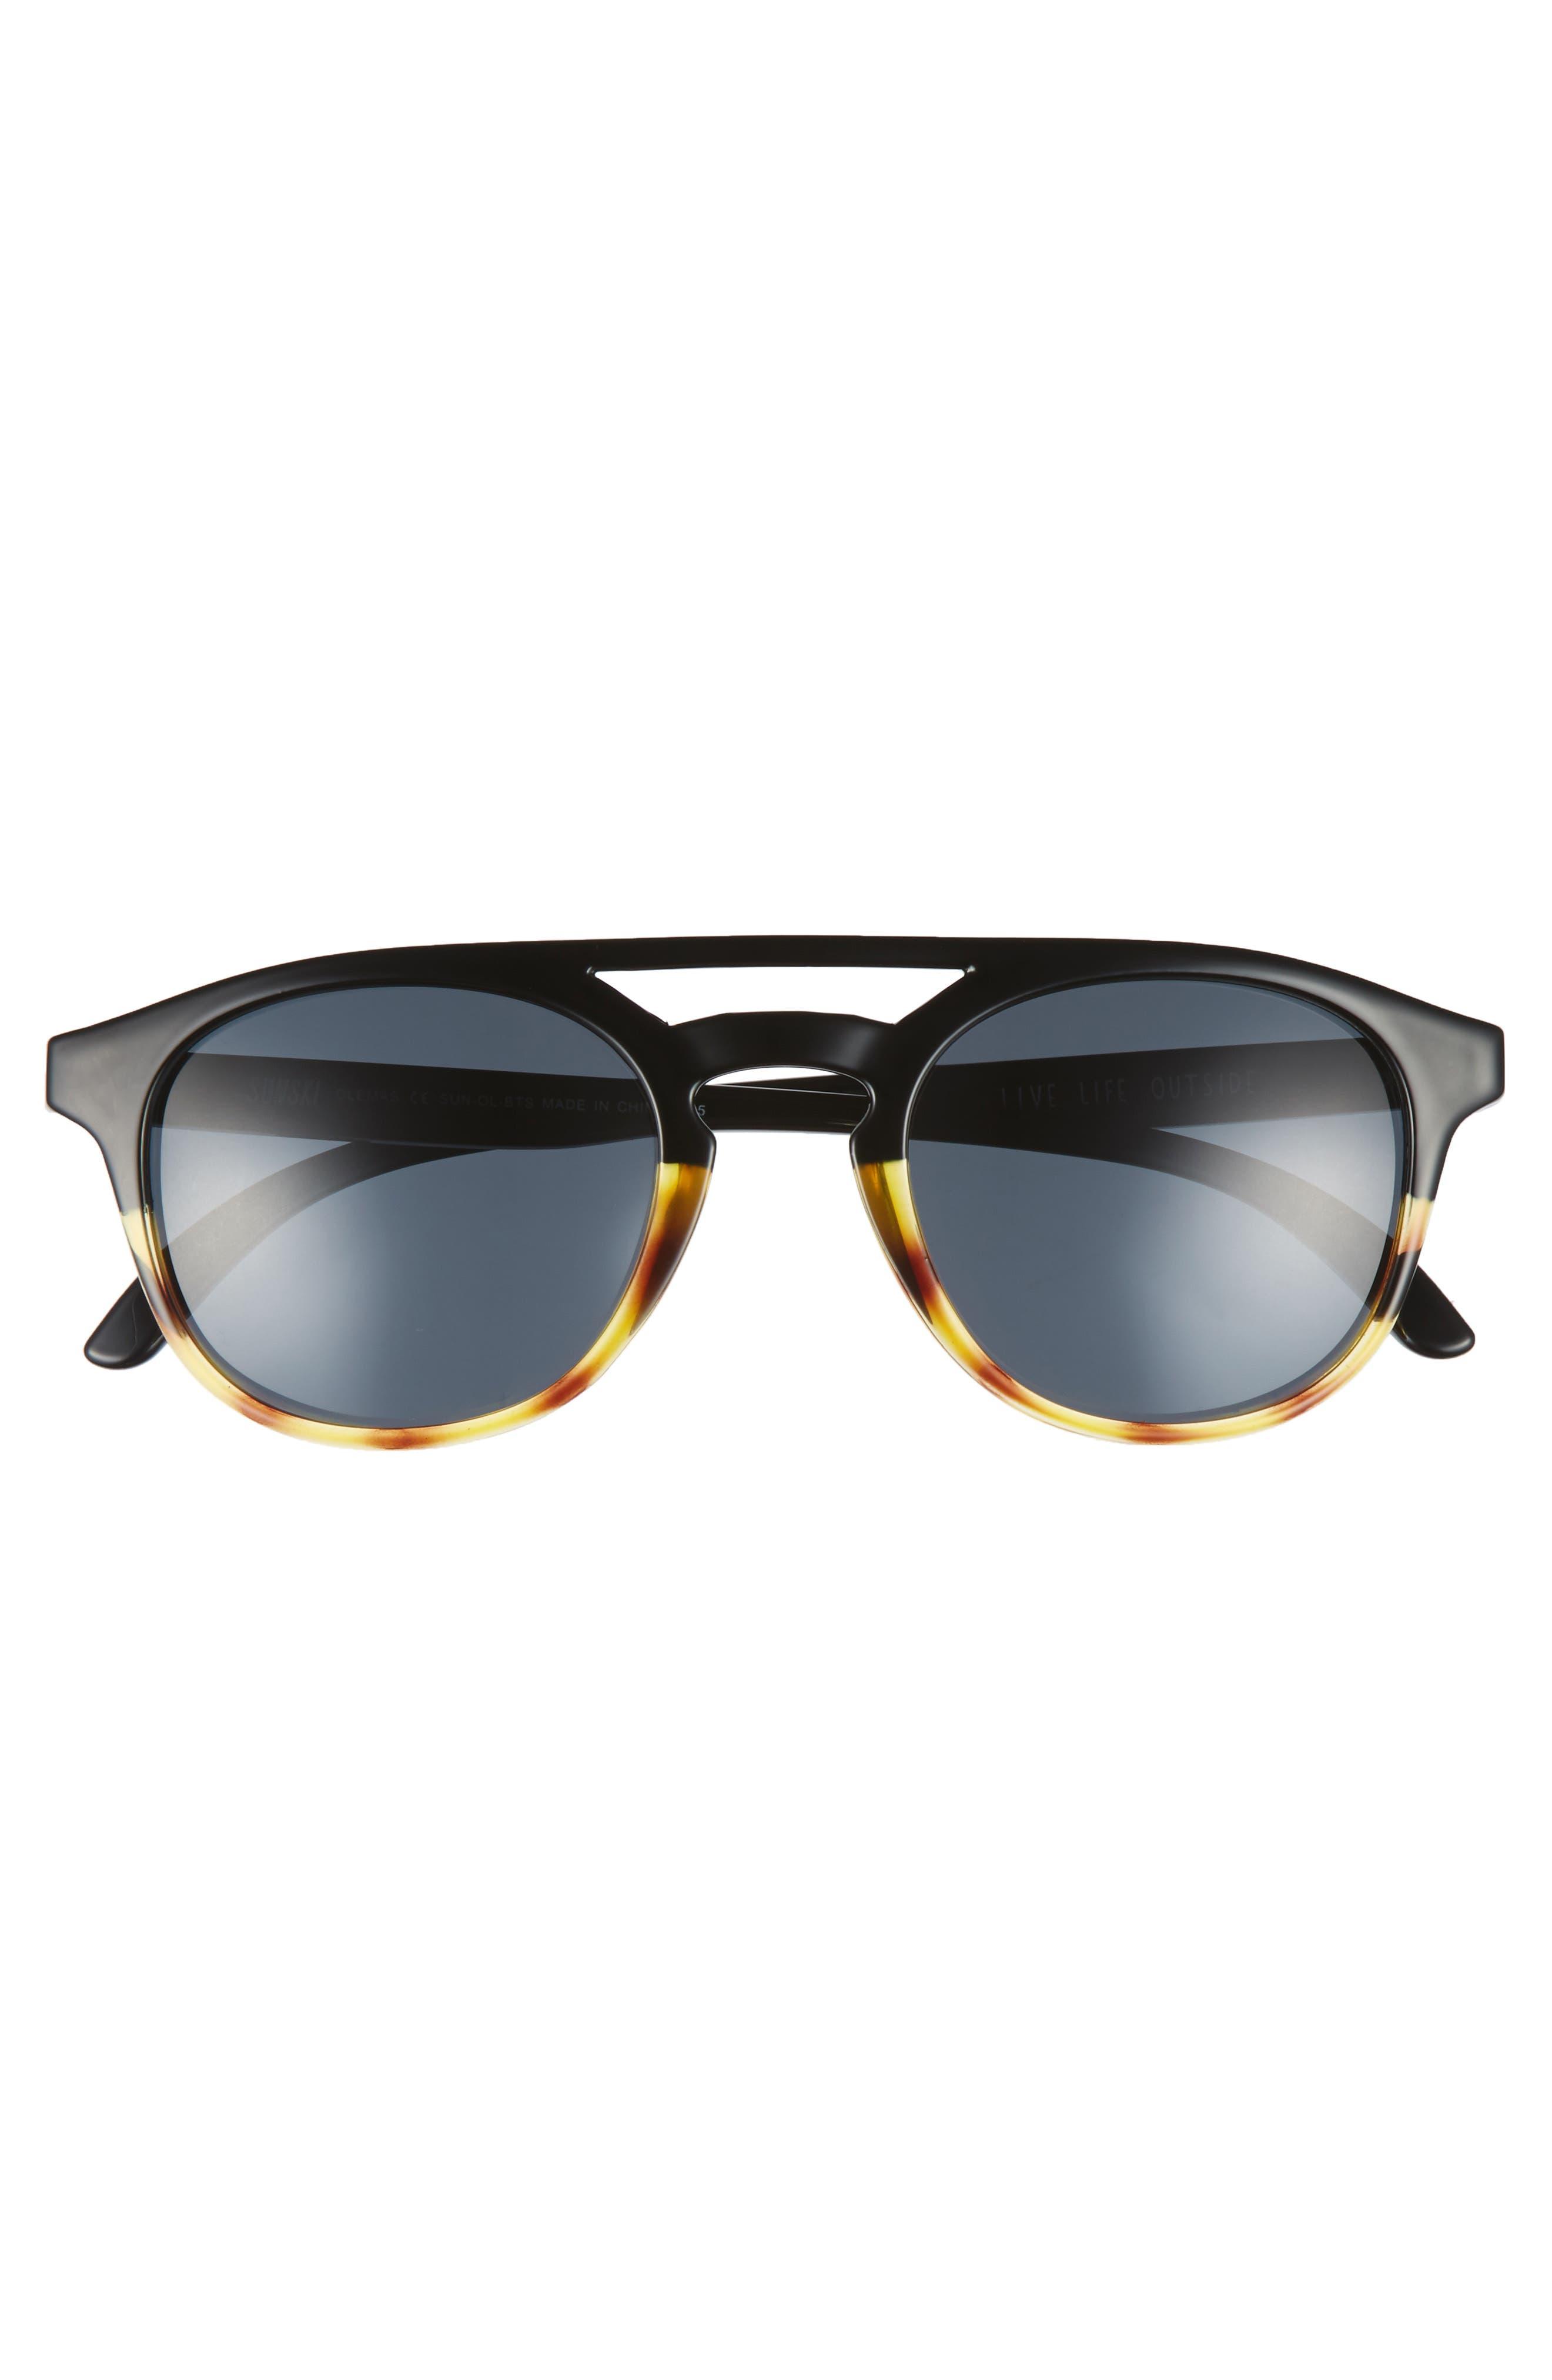 Olema 53mm Polarized Sunglasses,                             Alternate thumbnail 3, color,                             BLACK TORTOISE SLATE